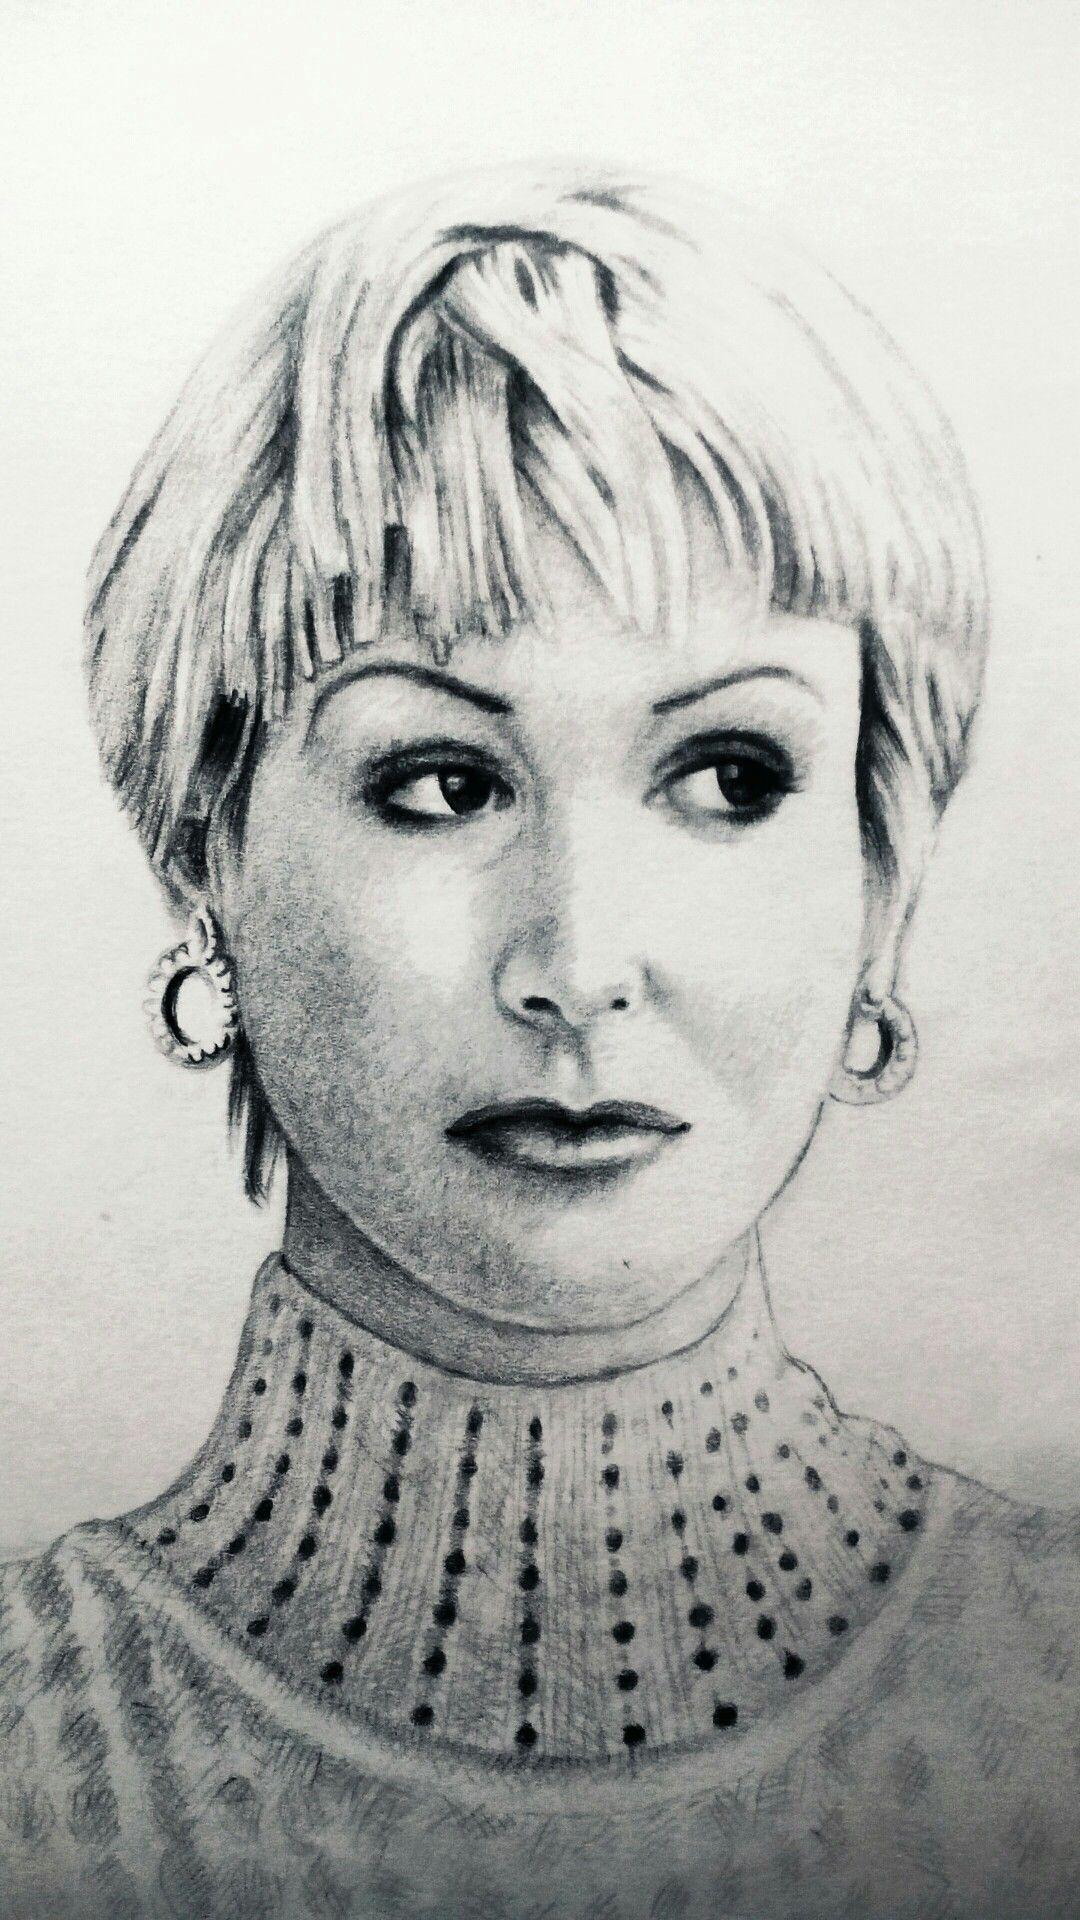 Beauty Pencil Sketch by Ali Shaikh Artist Pakistani Painter